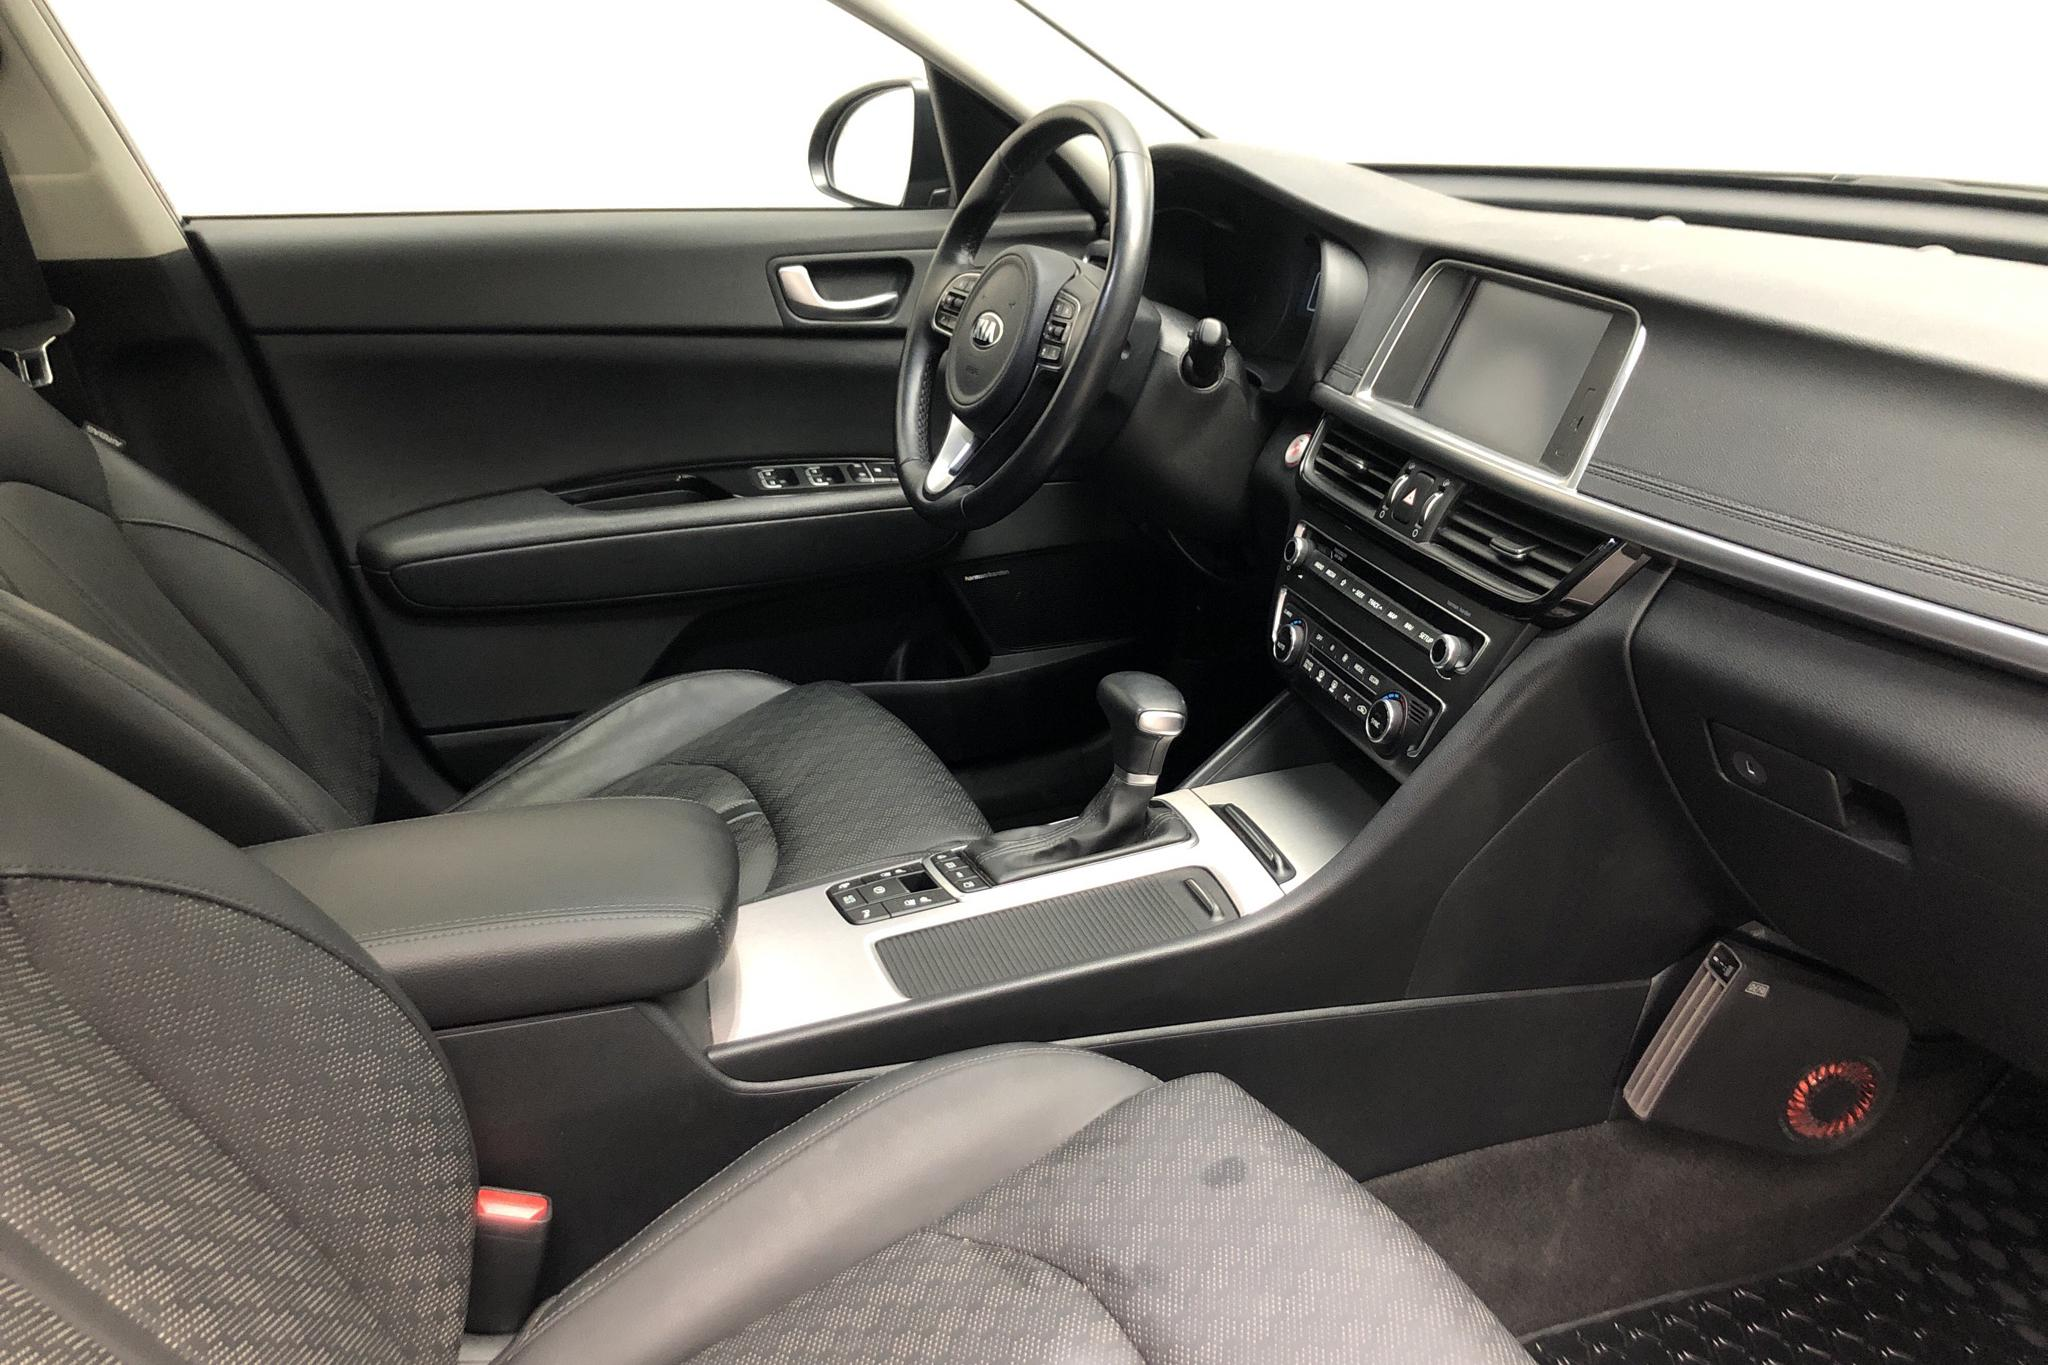 KIA Optima 2.0 GDi Plug-in Hybrid SW (205hk) - 42 710 km - Automatic - gray - 2018